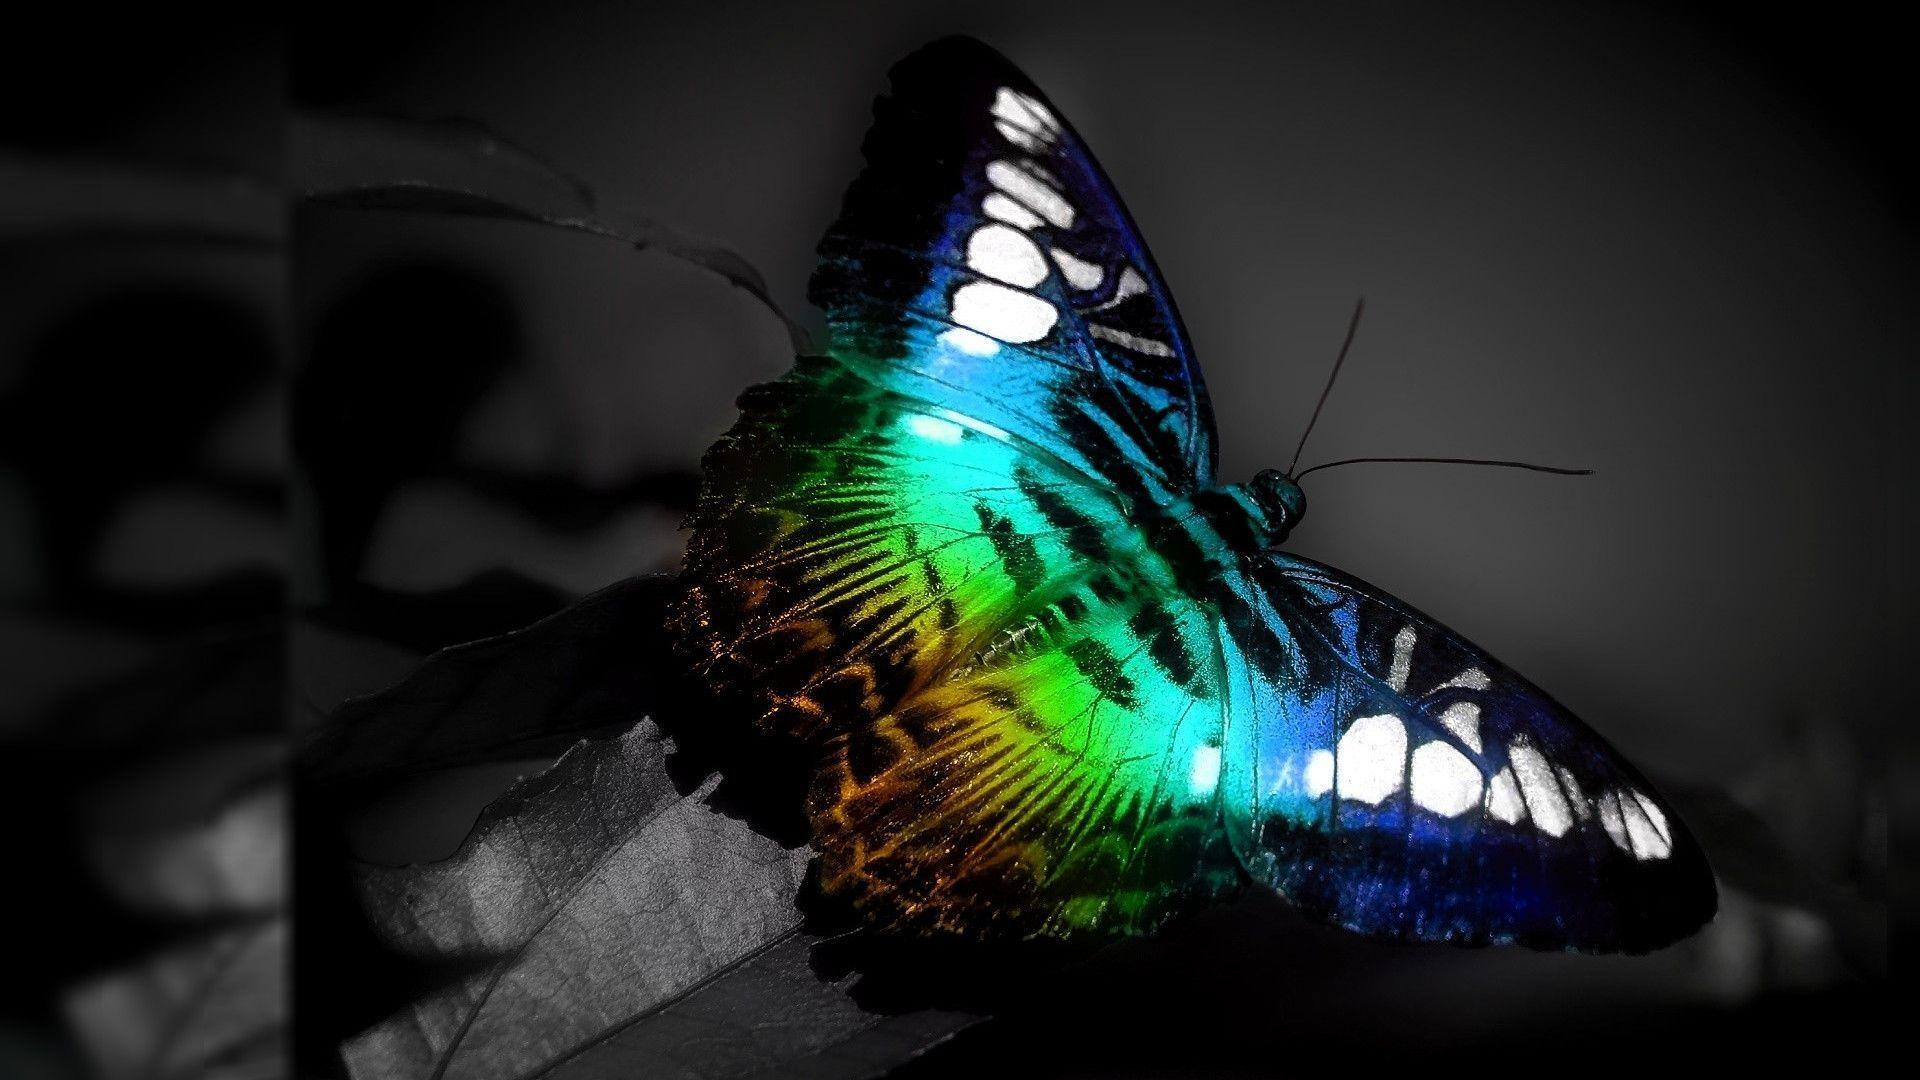 Butterfly Desktop Backgrounds - Wallpaper Cave